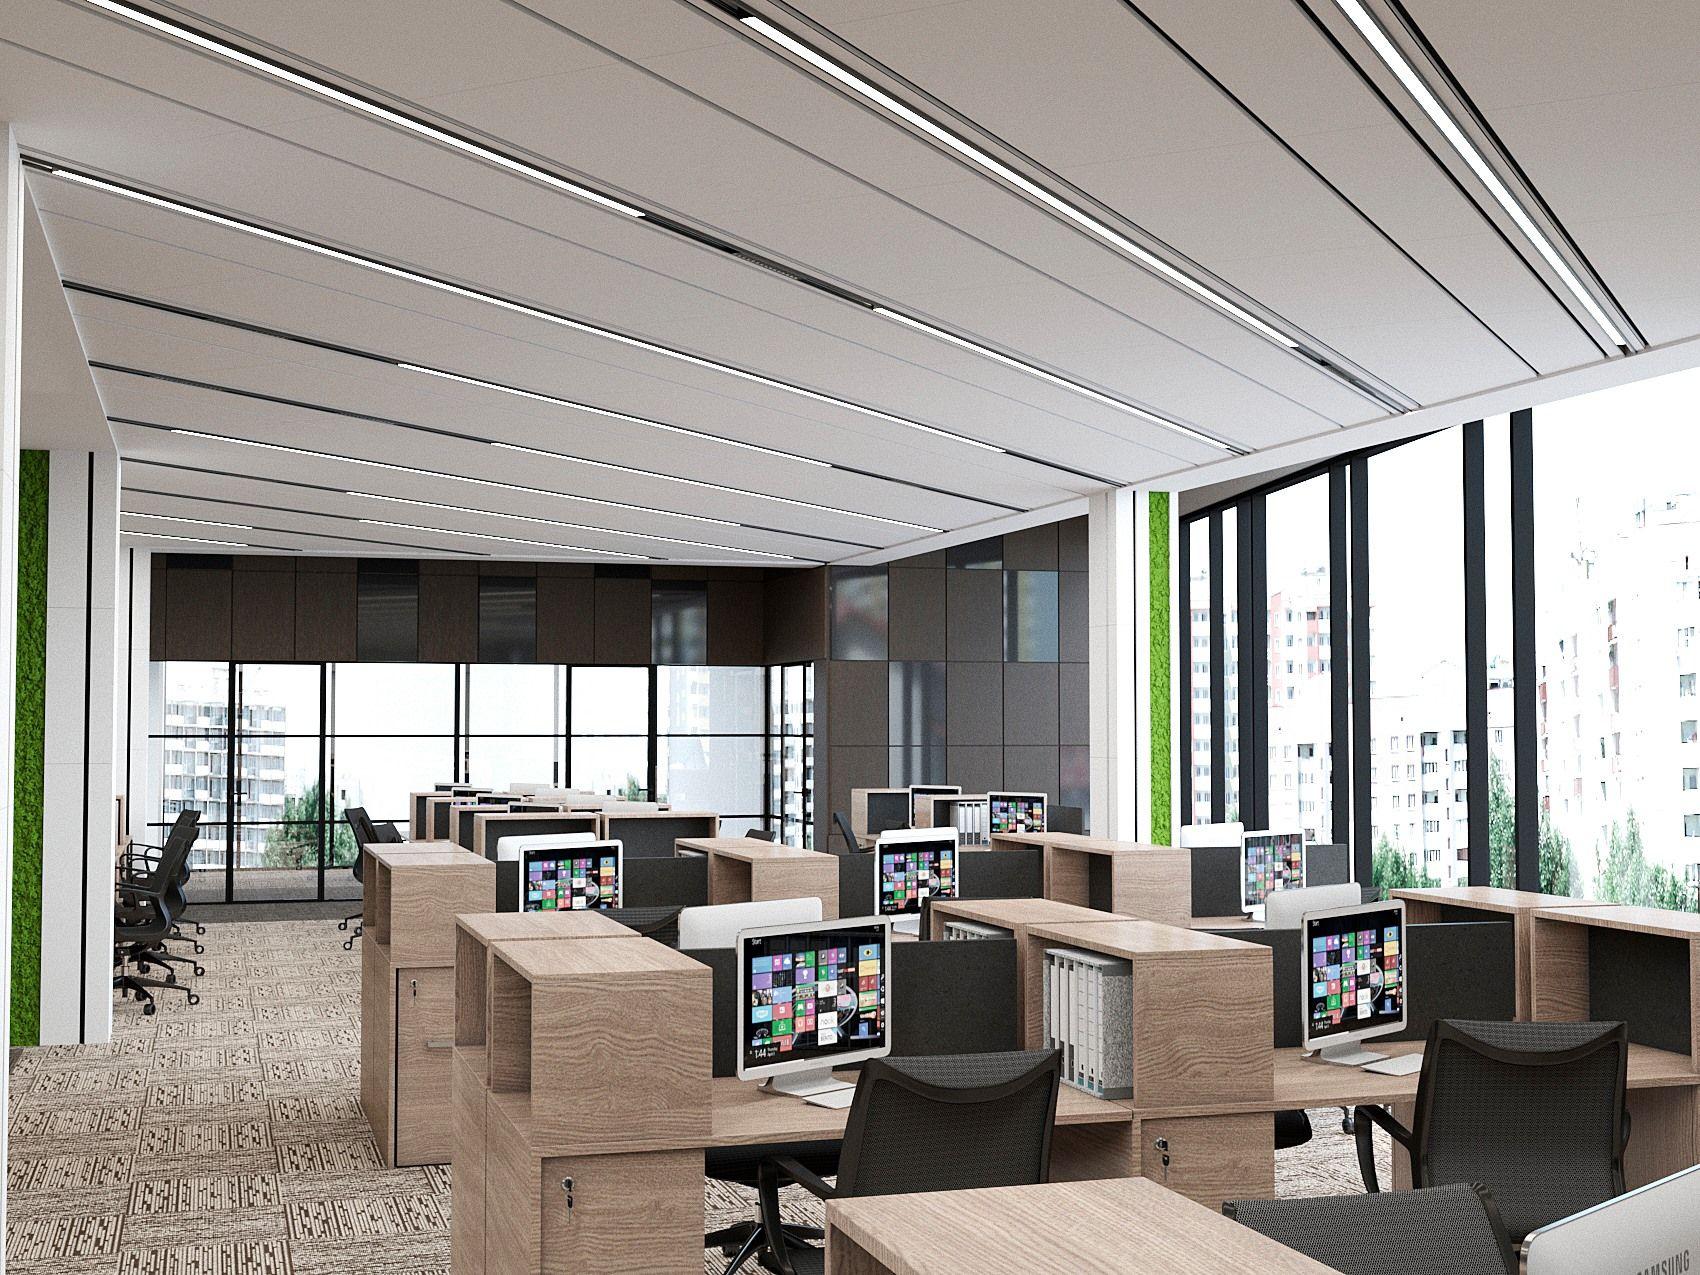 open space офис, дизайн интерьера | Outdoor decor, Home decor, Decor